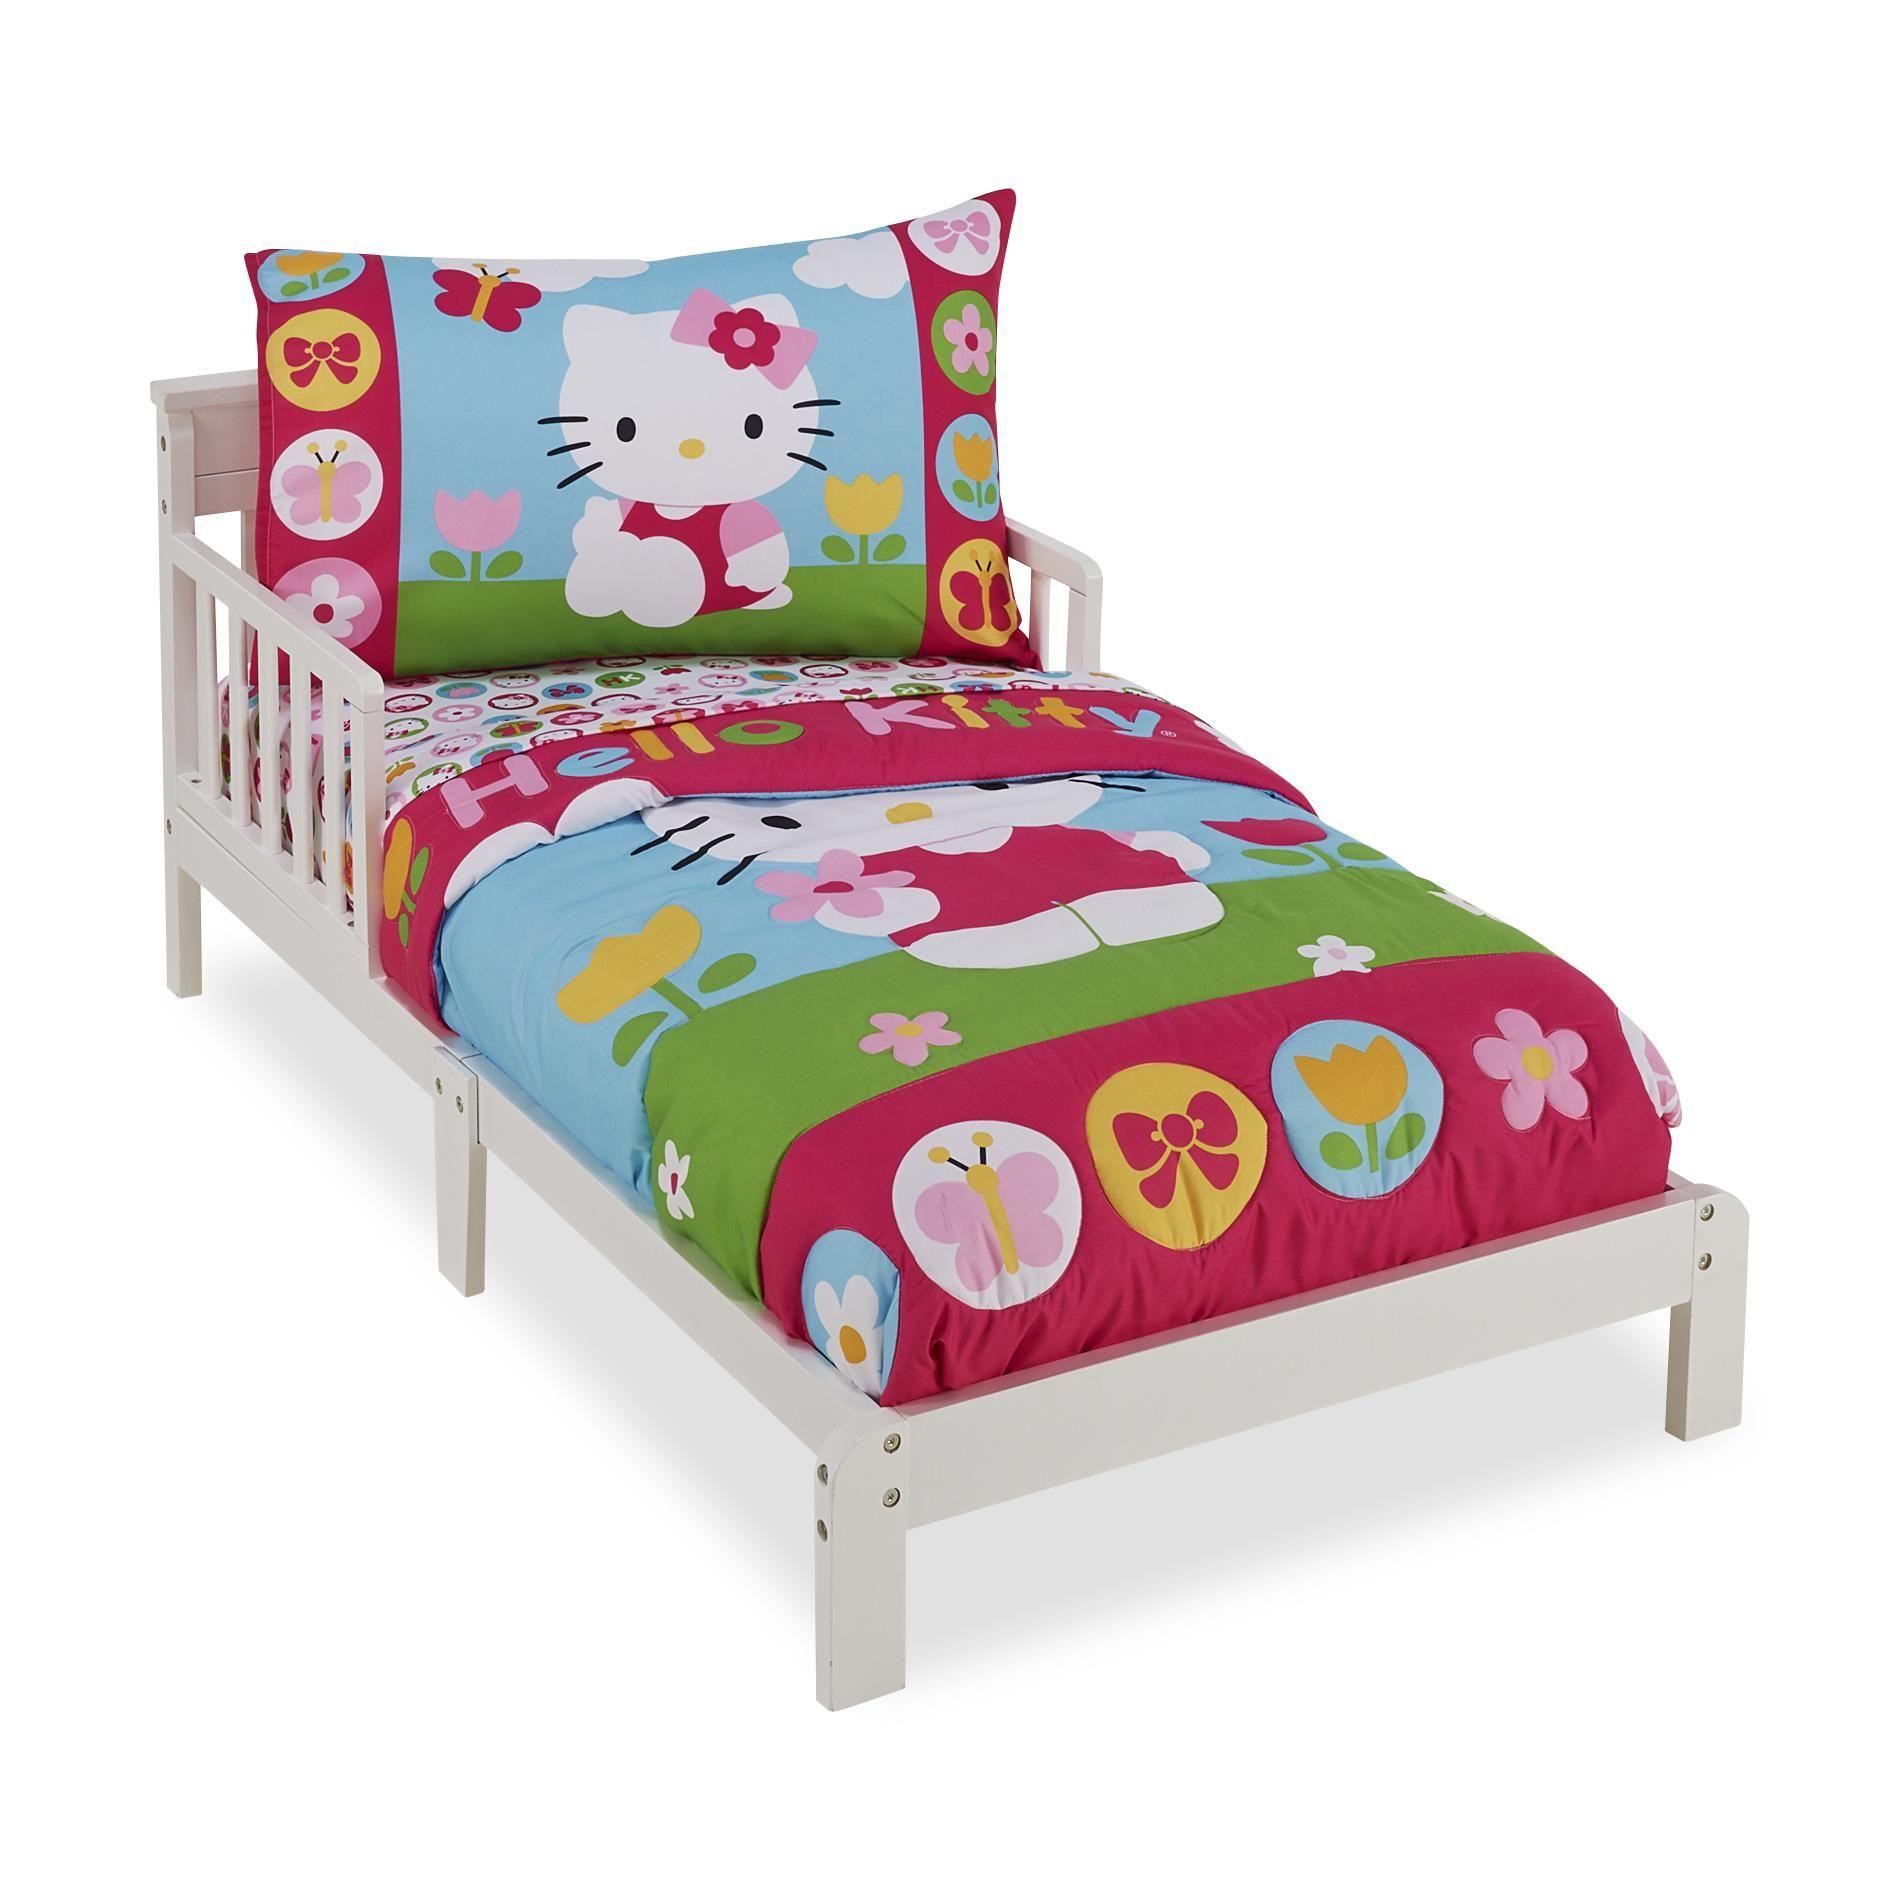 Hello kitty toddler bed frame - Good Hello Kitty Toddler Bedding Design Idea